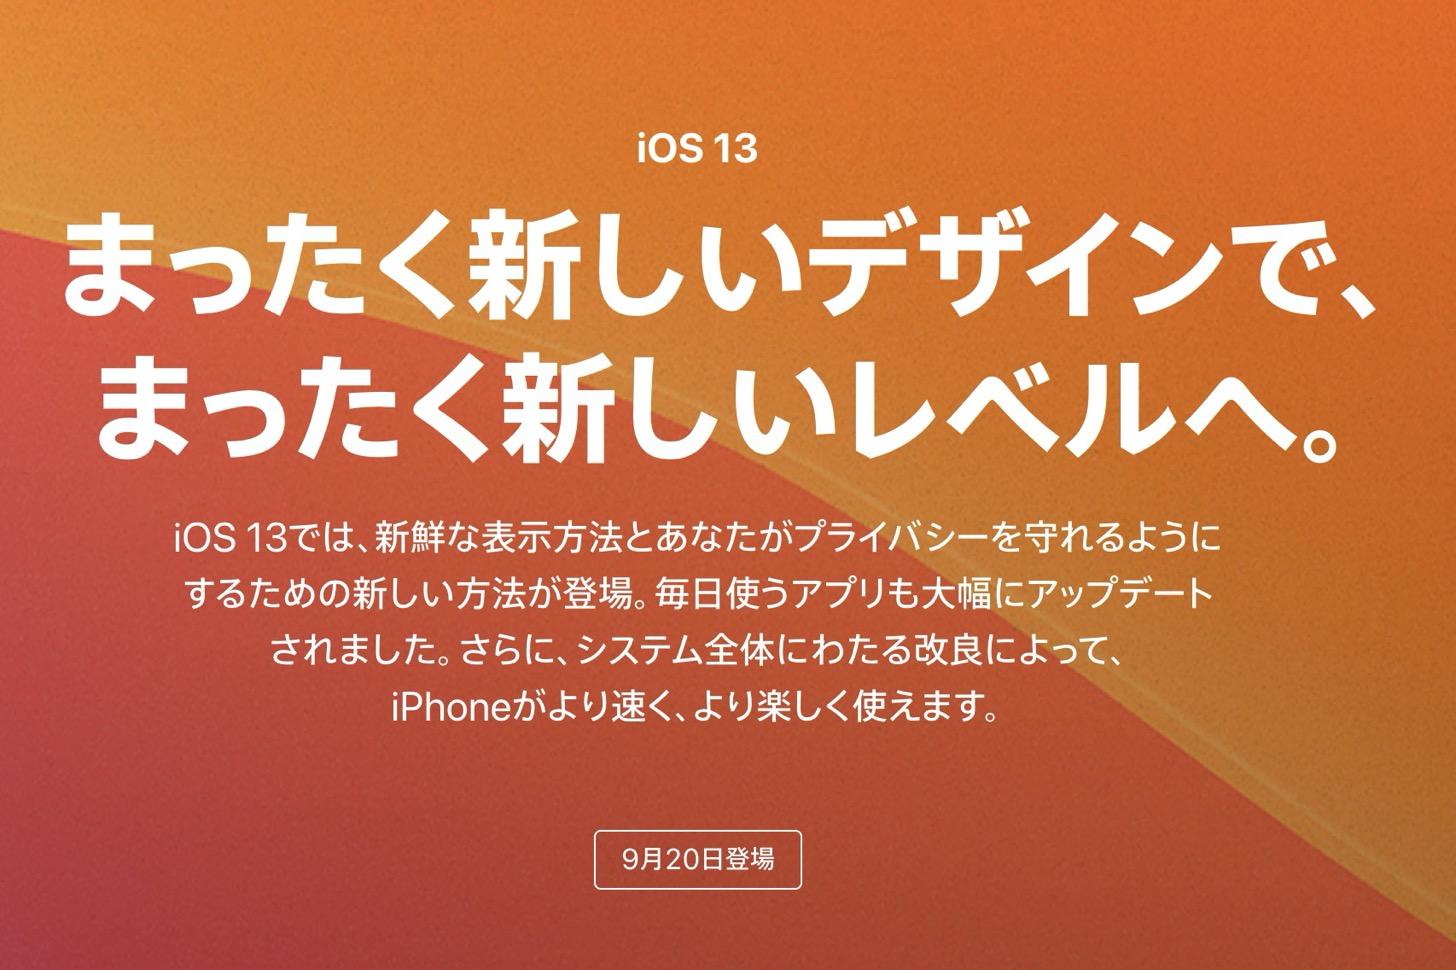 iOS13の配信日は9月20日